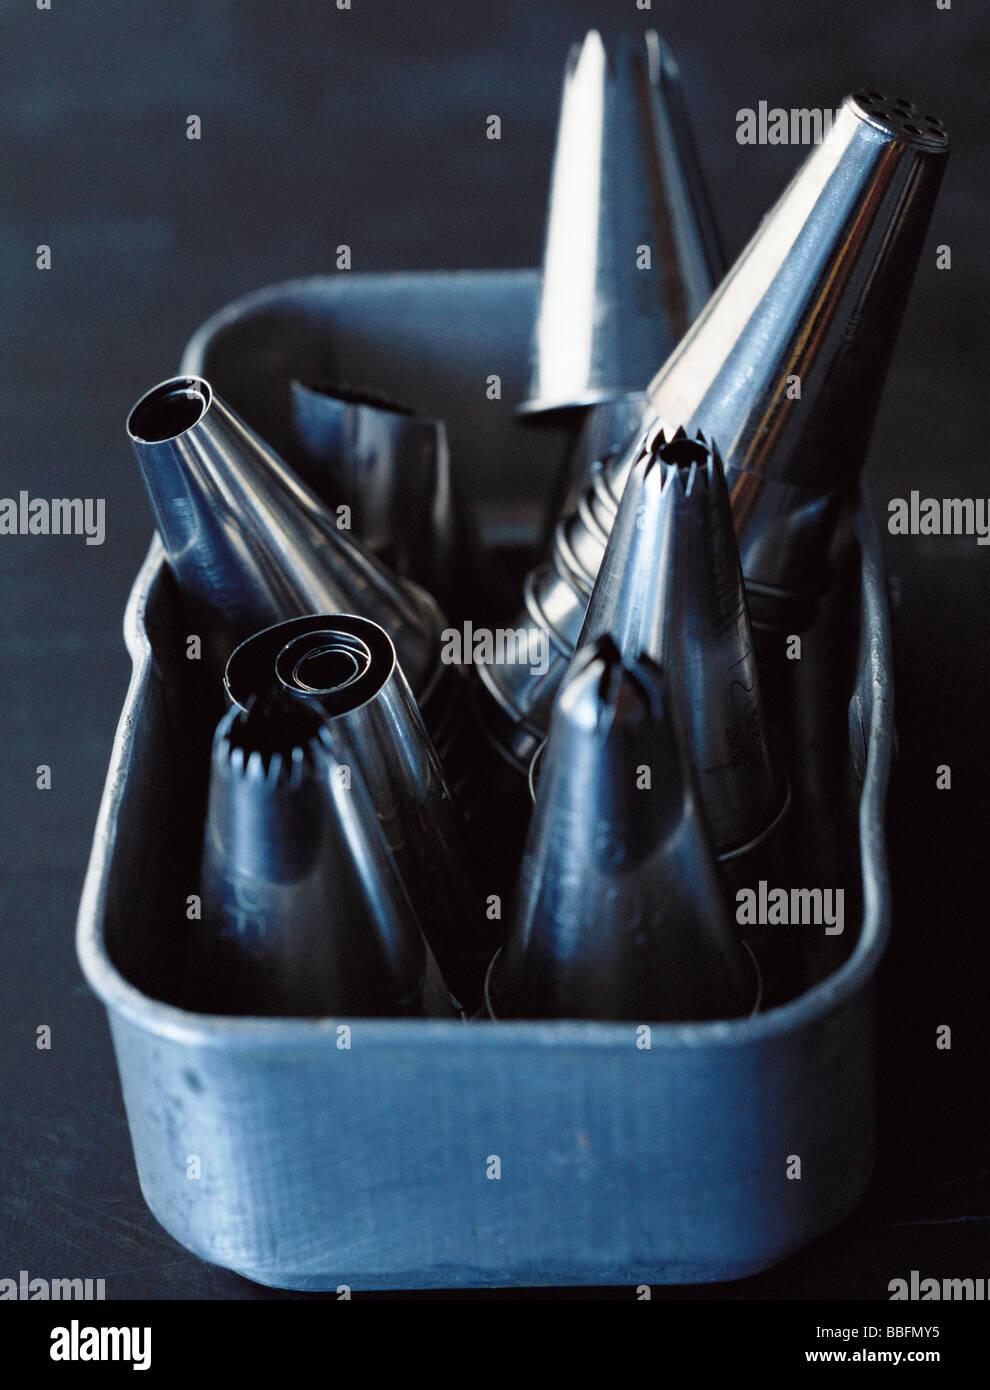 Metal icing nozzles Stock Photo